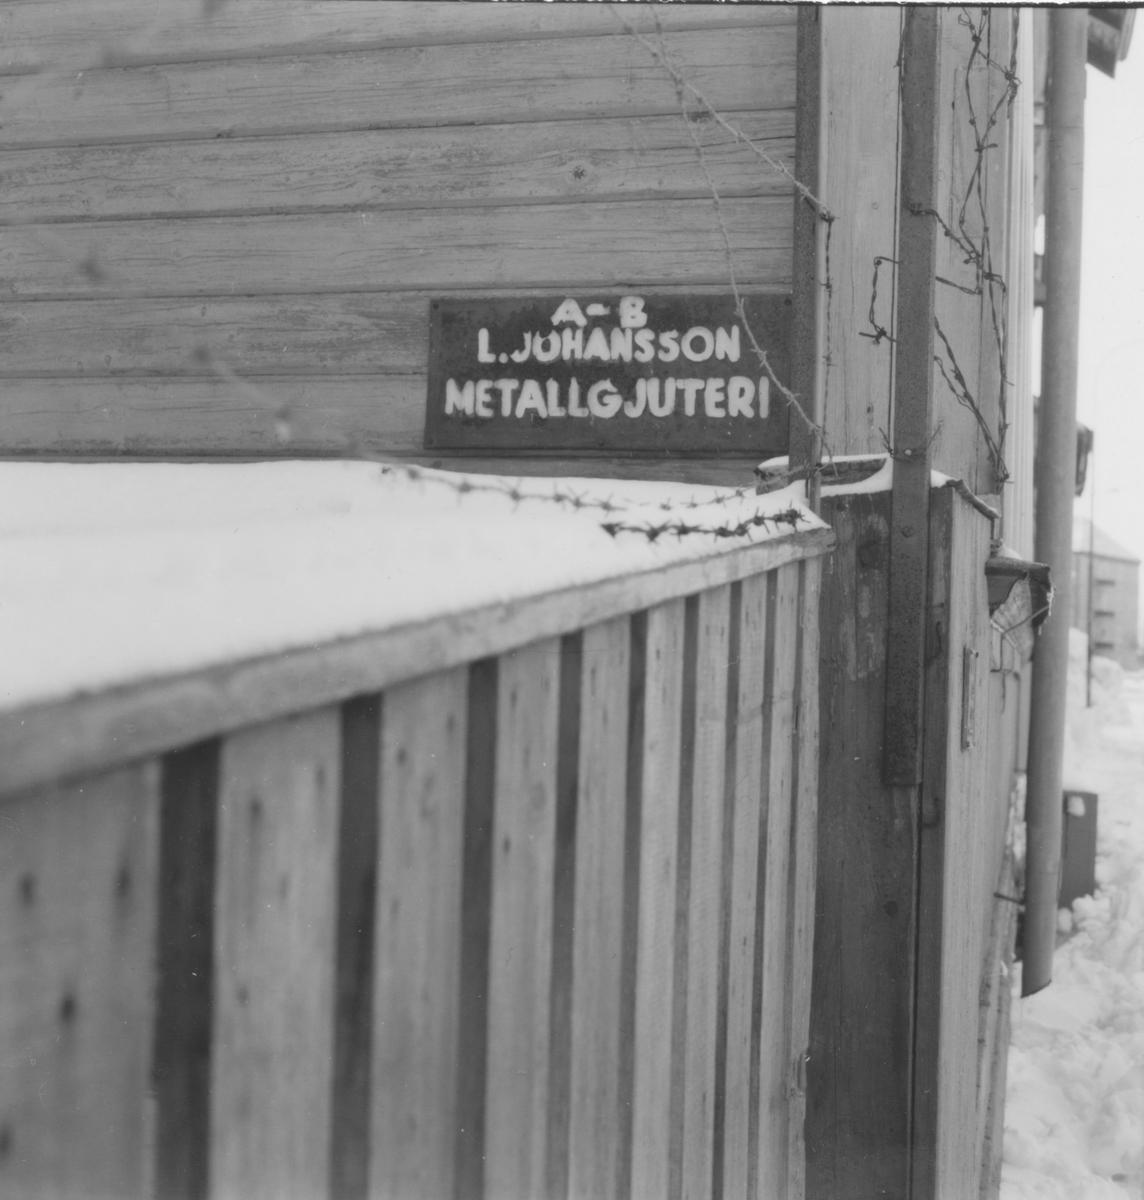 Detalj, skylt AB L. Johansson Metallgjuteri.